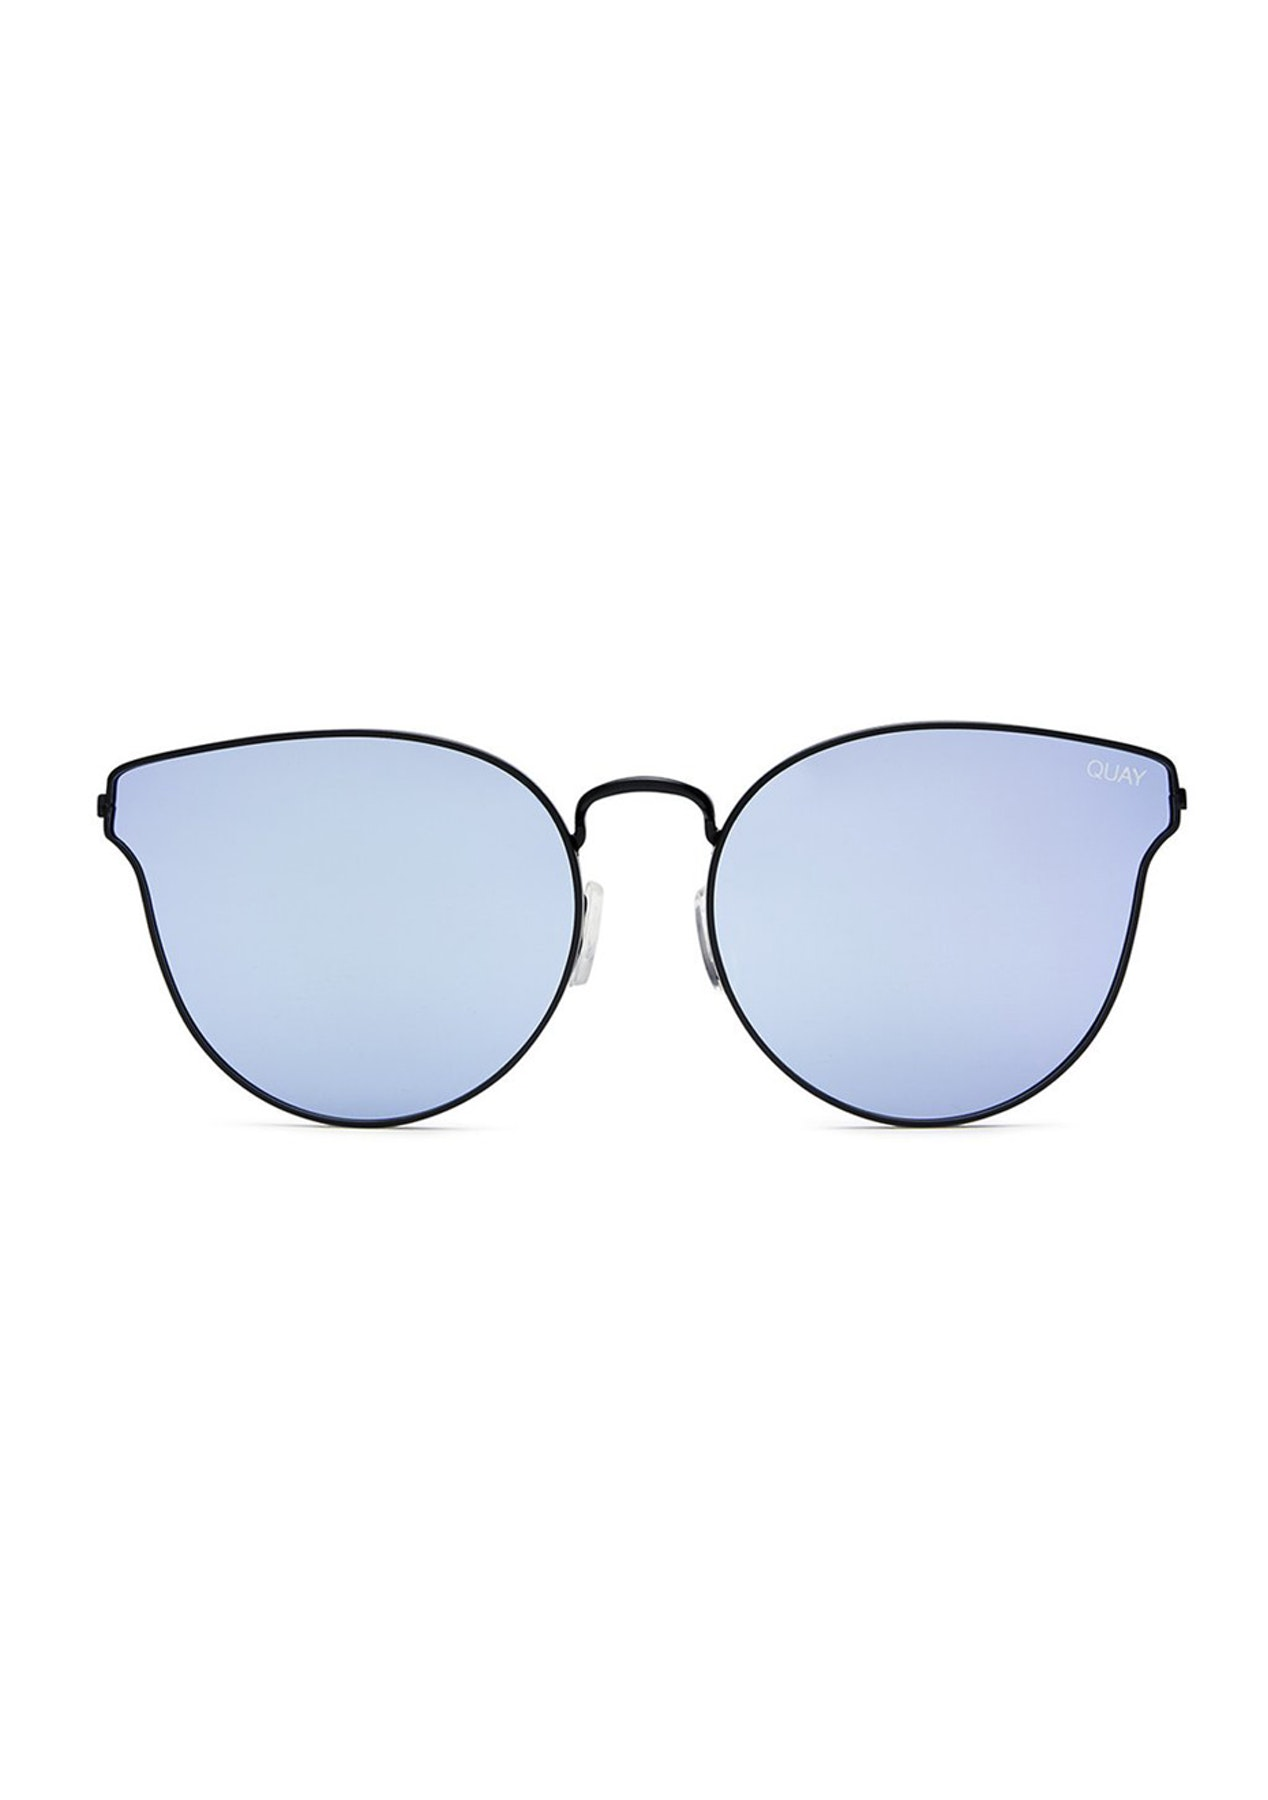 617e4b823ec Quay - All My Love - Black   Purple Mirror - Quay Eyewear - New Styles  Added - Onceit